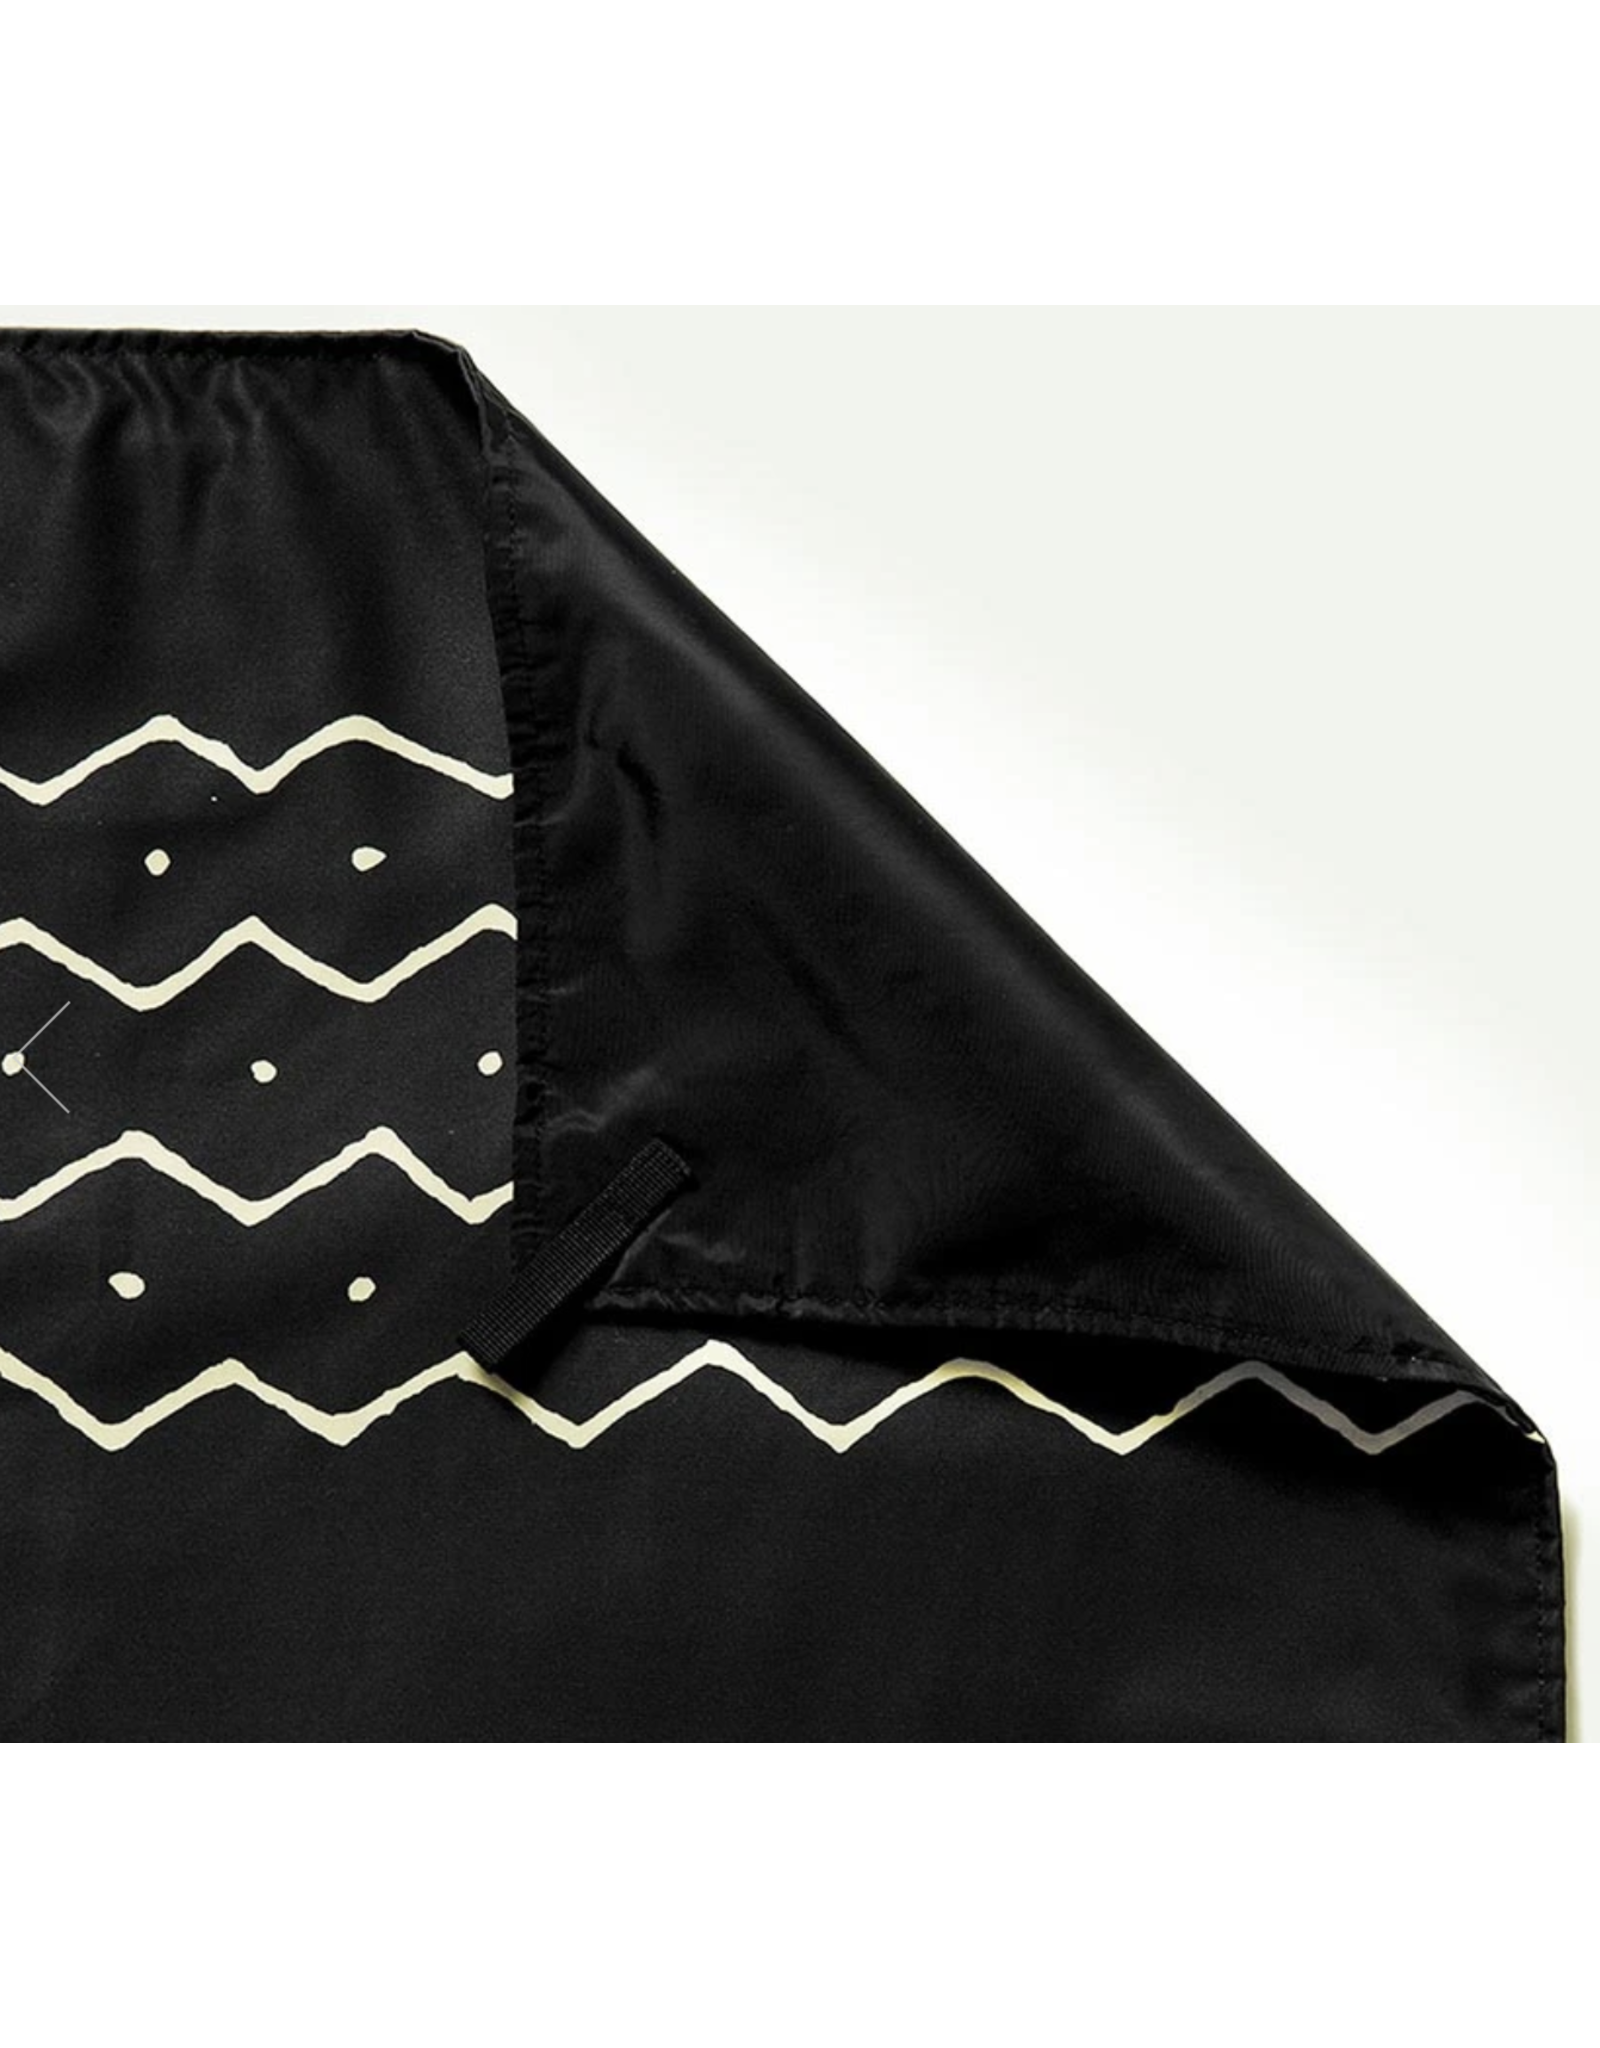 Nomadix Festival Blanket